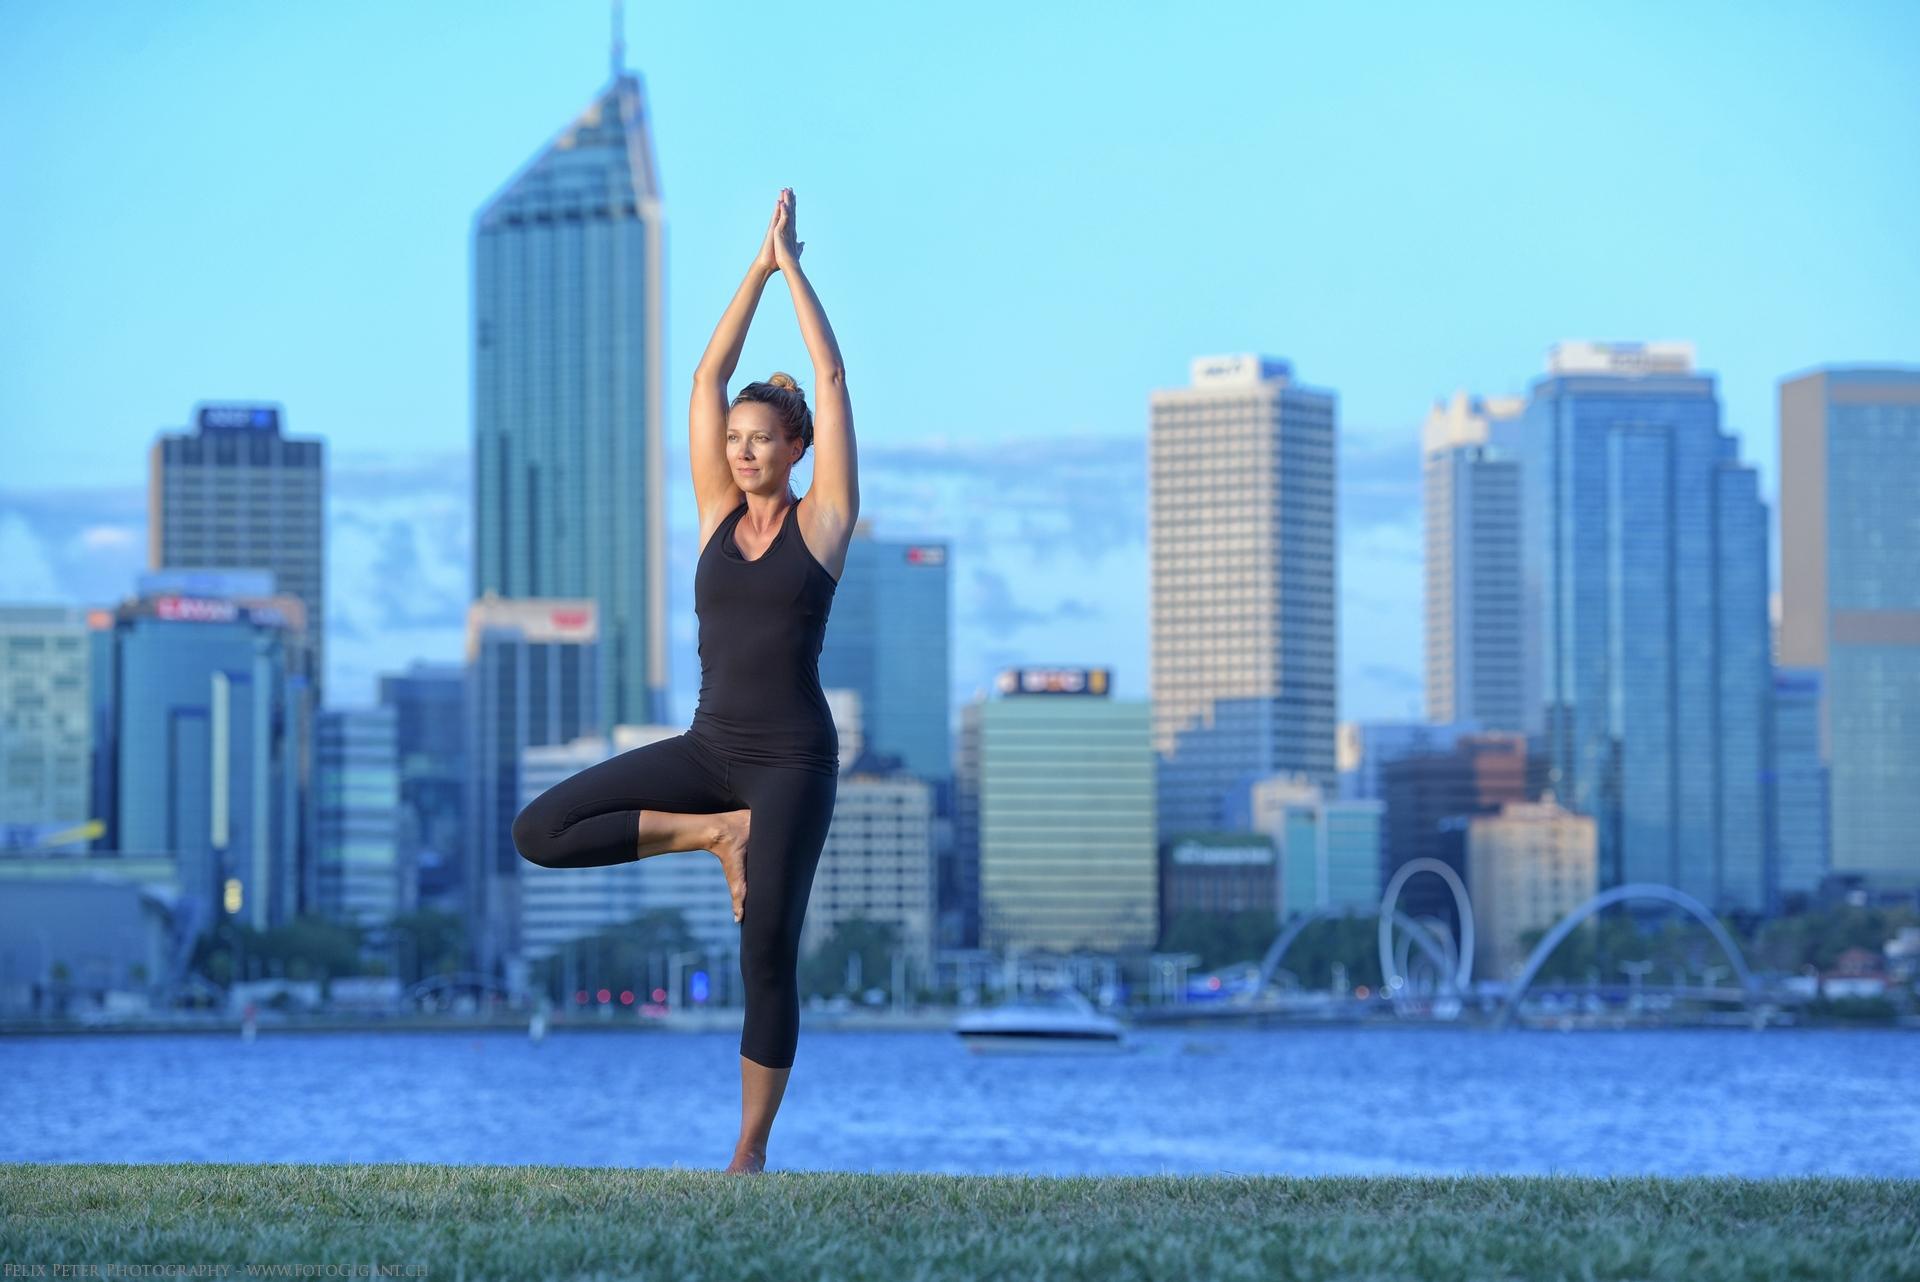 Felix-Peter-Yoga-Pilates-Dance-Fotografie_Bern_133.jpg